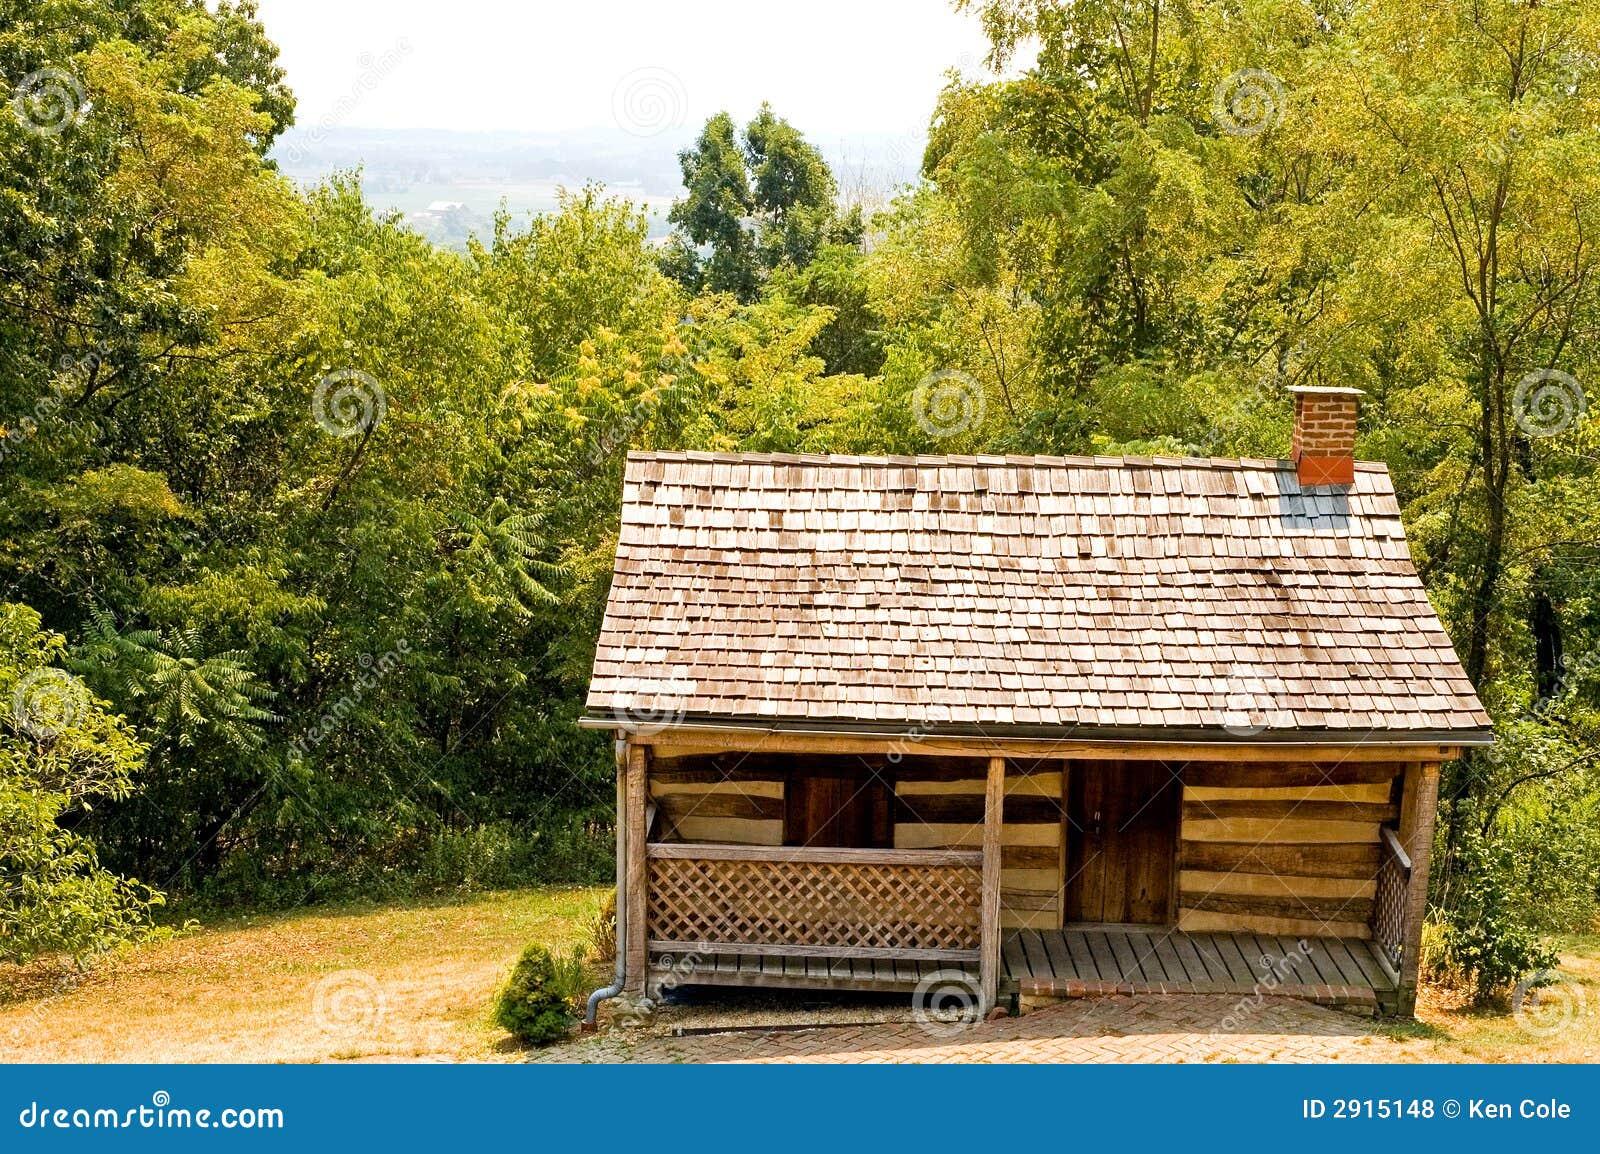 old pioneer log cabin stock photo image of building wood 2915148. Black Bedroom Furniture Sets. Home Design Ideas